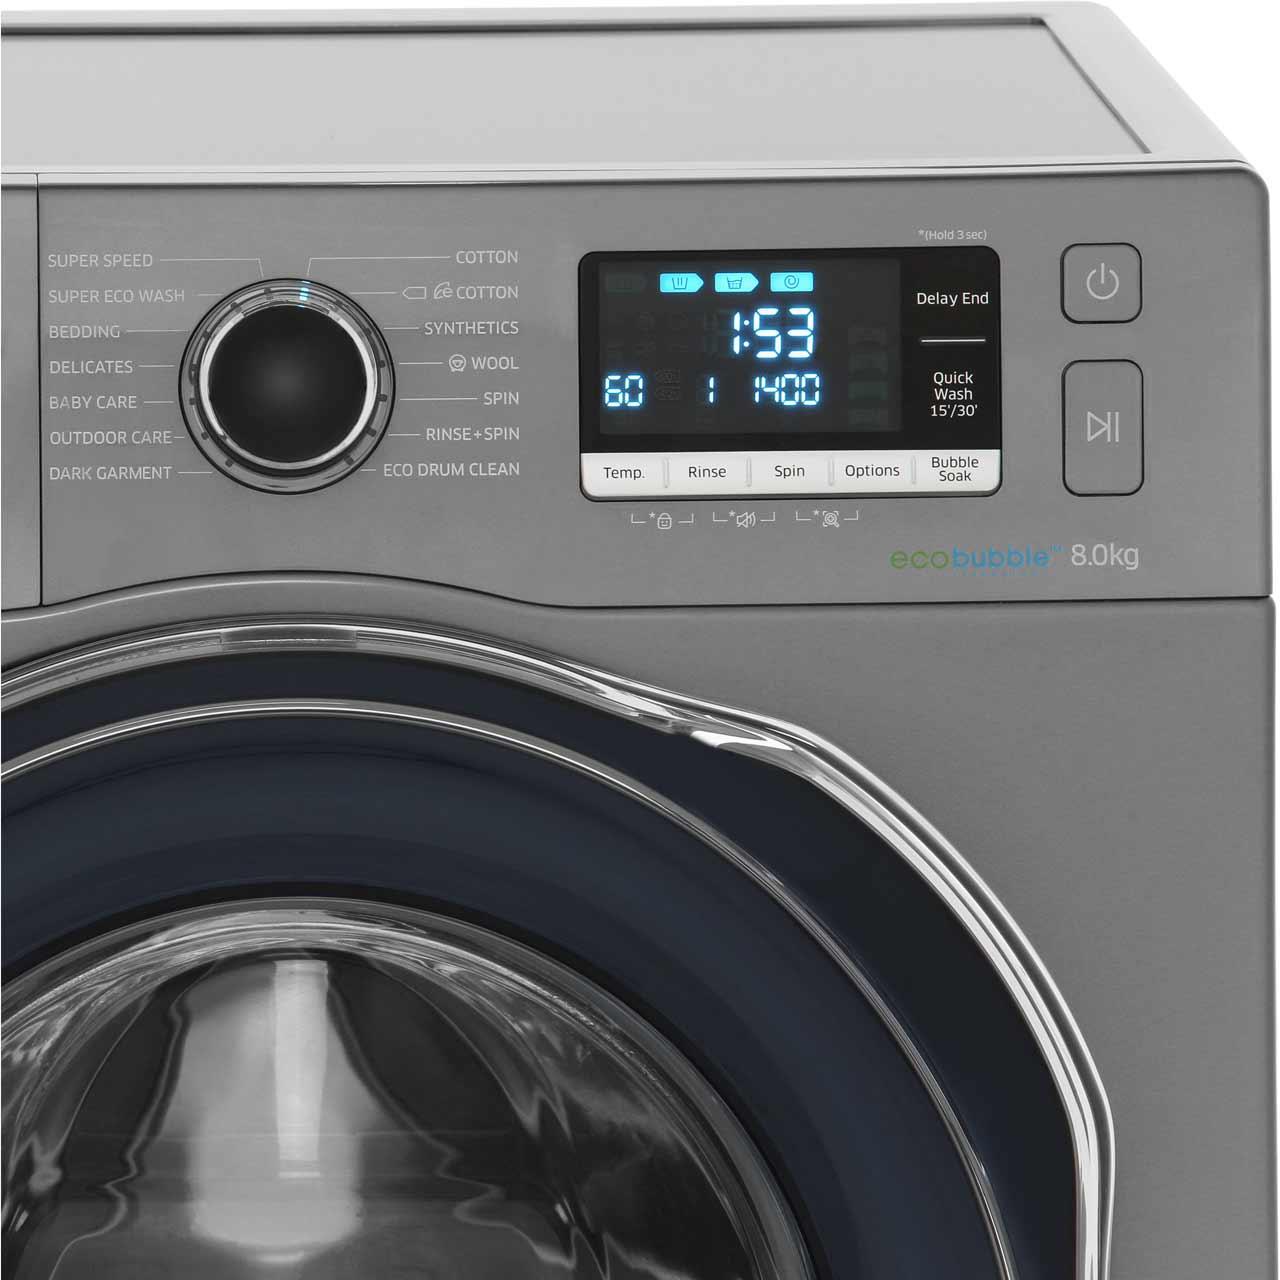 Samsung Ecobubble Ww80j6410cx 8kg Washing Machine With 1400 Rpm